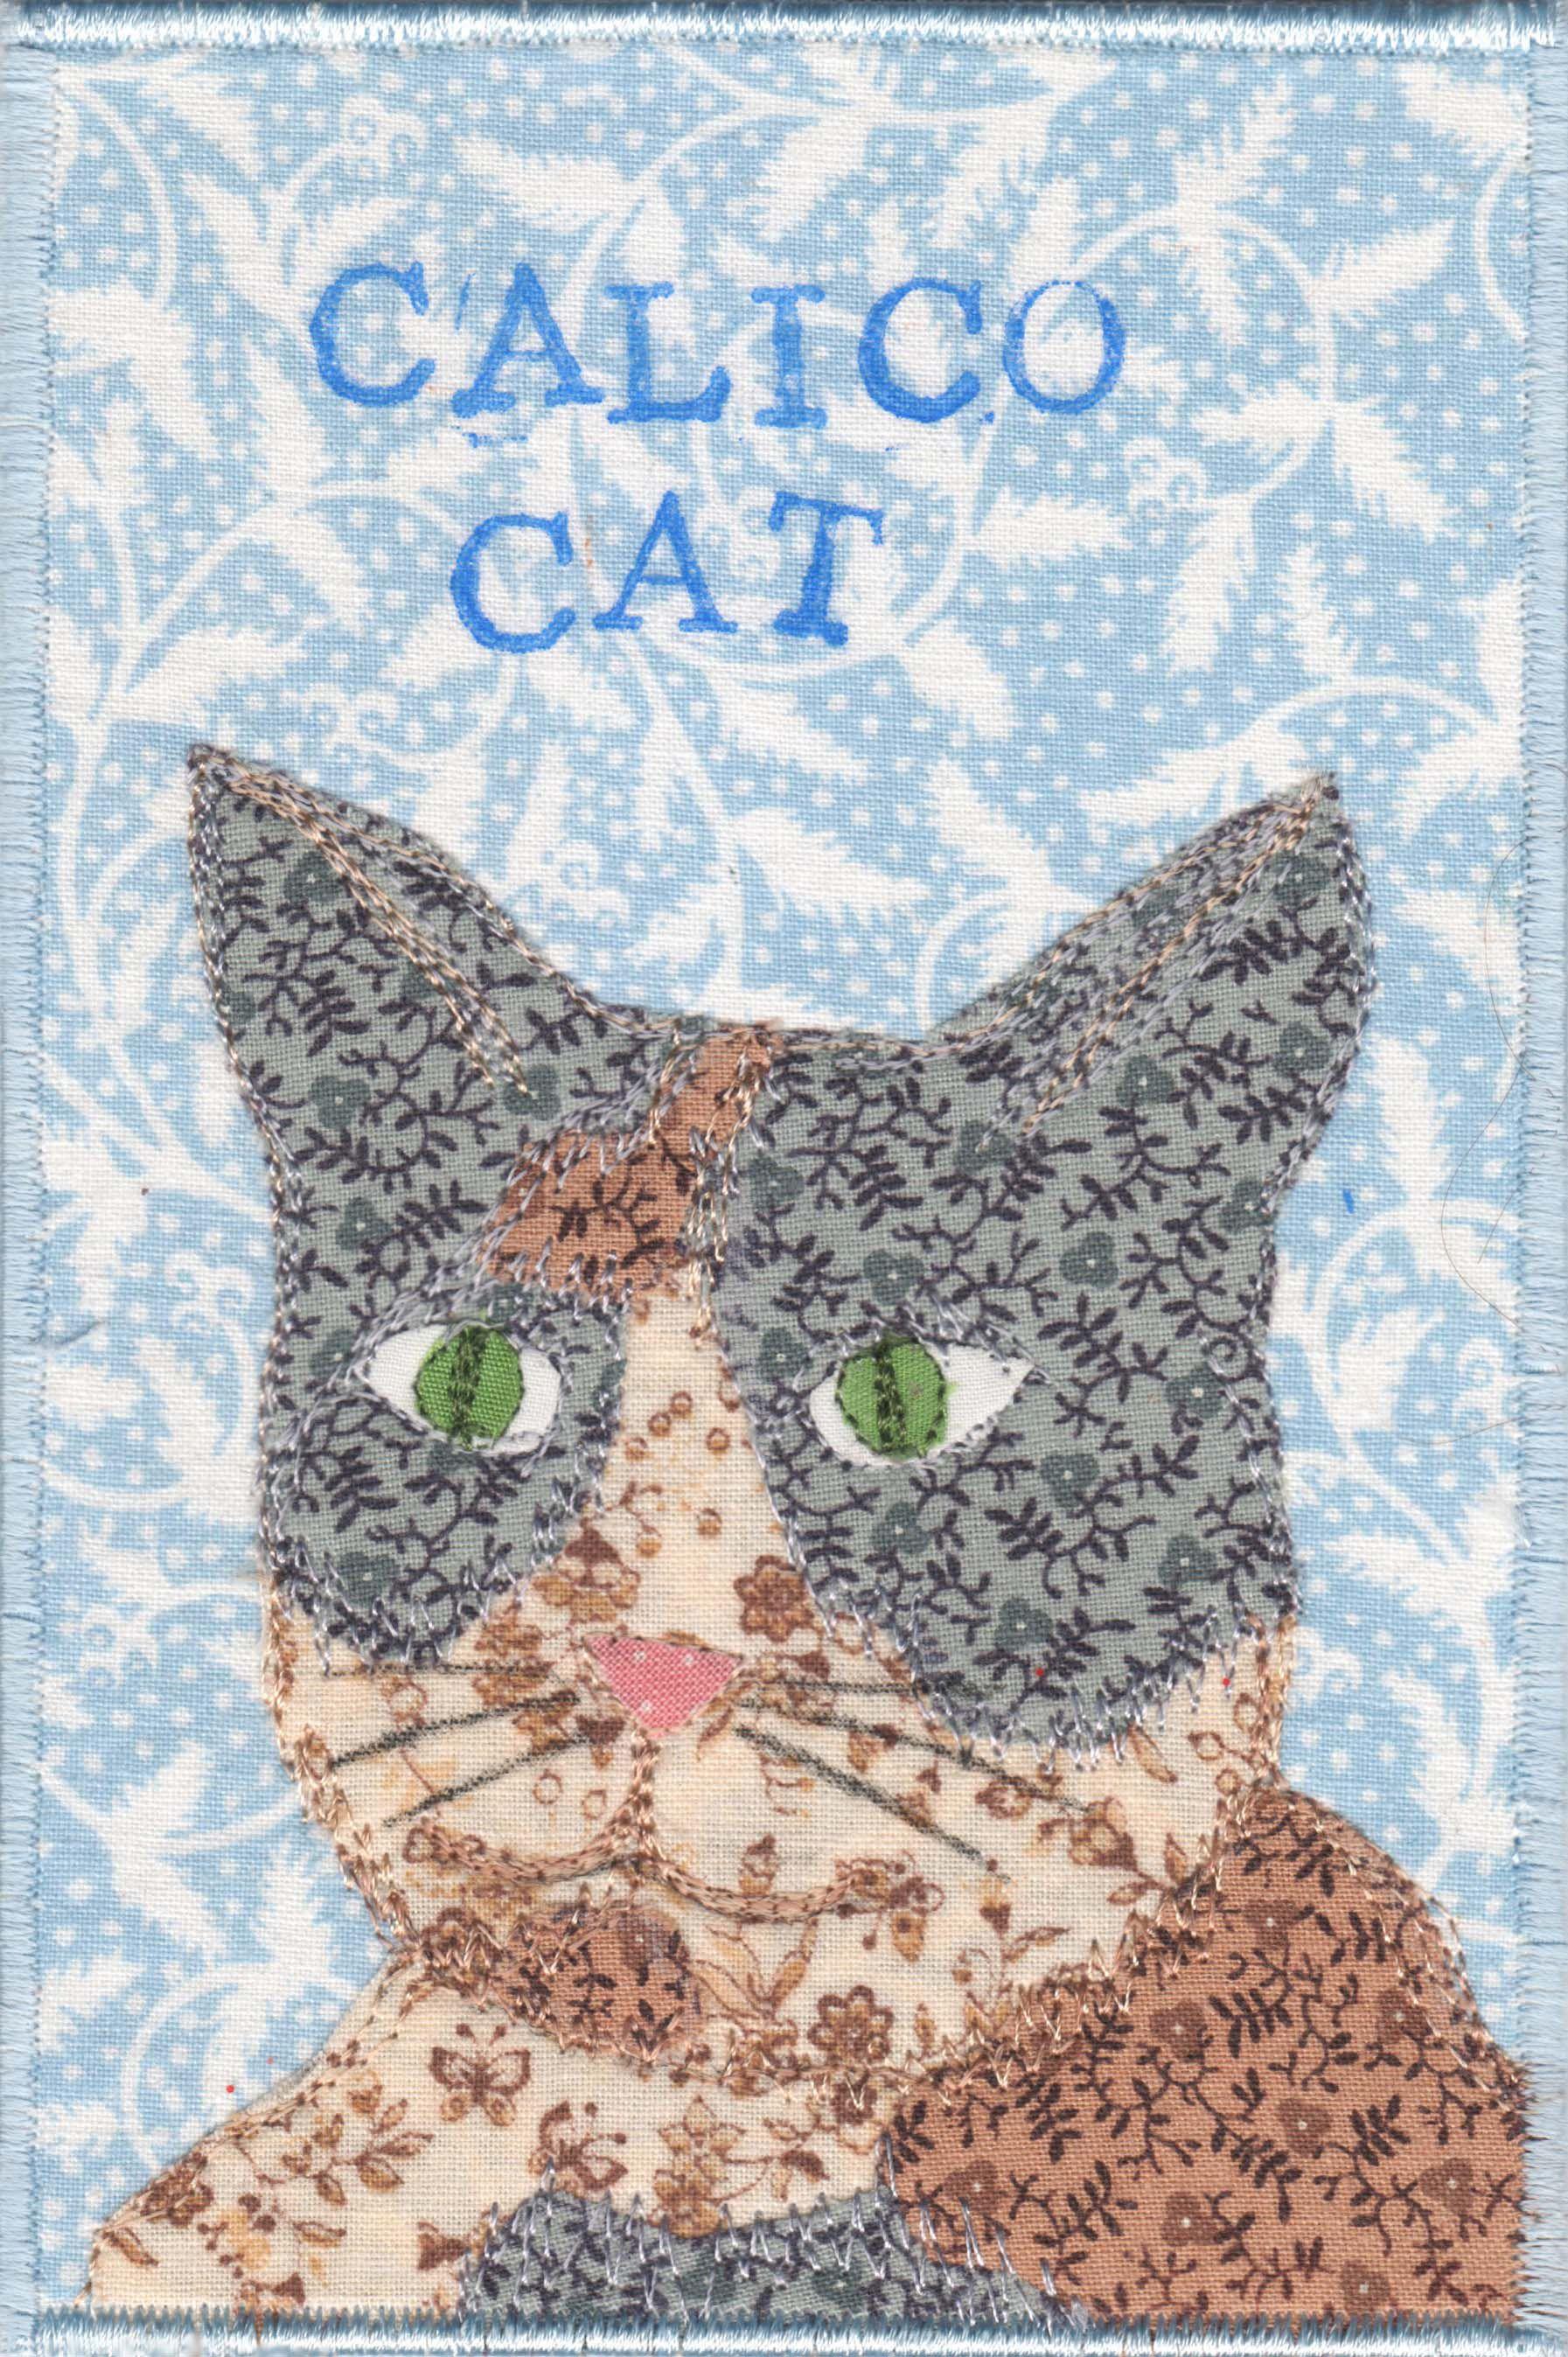 Calico Cat fabric postcard by Diane Herbort